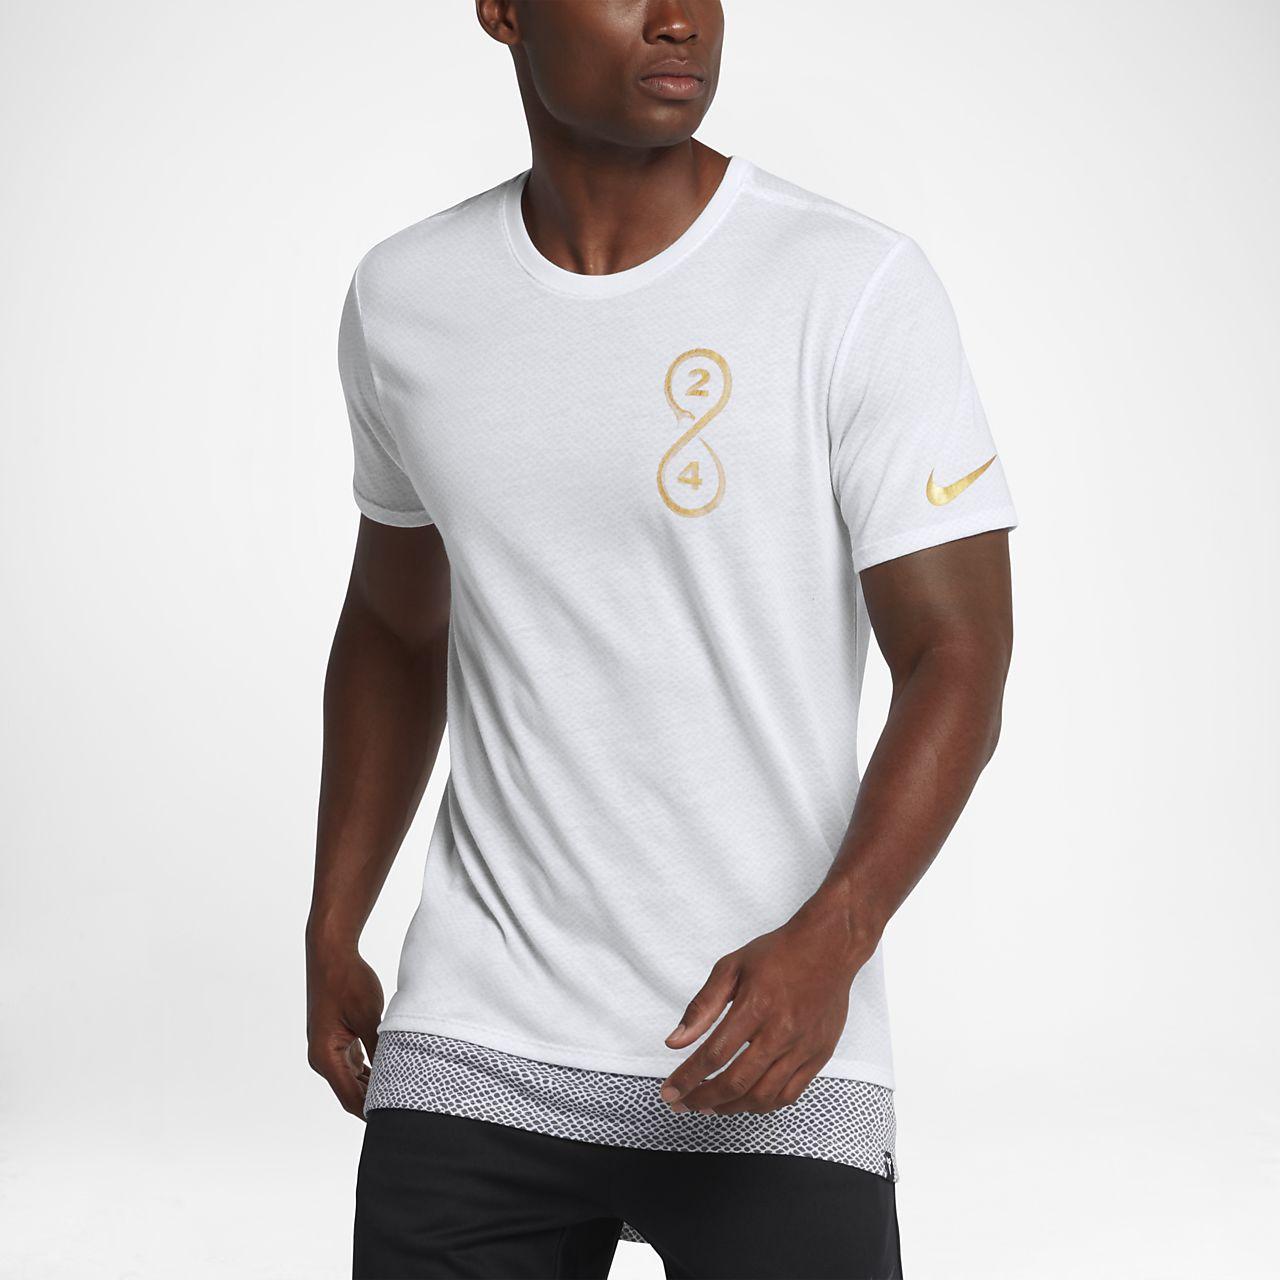 3bb364ab28d2 detail 2 view of mens nike droptail swoosh t shirt in white